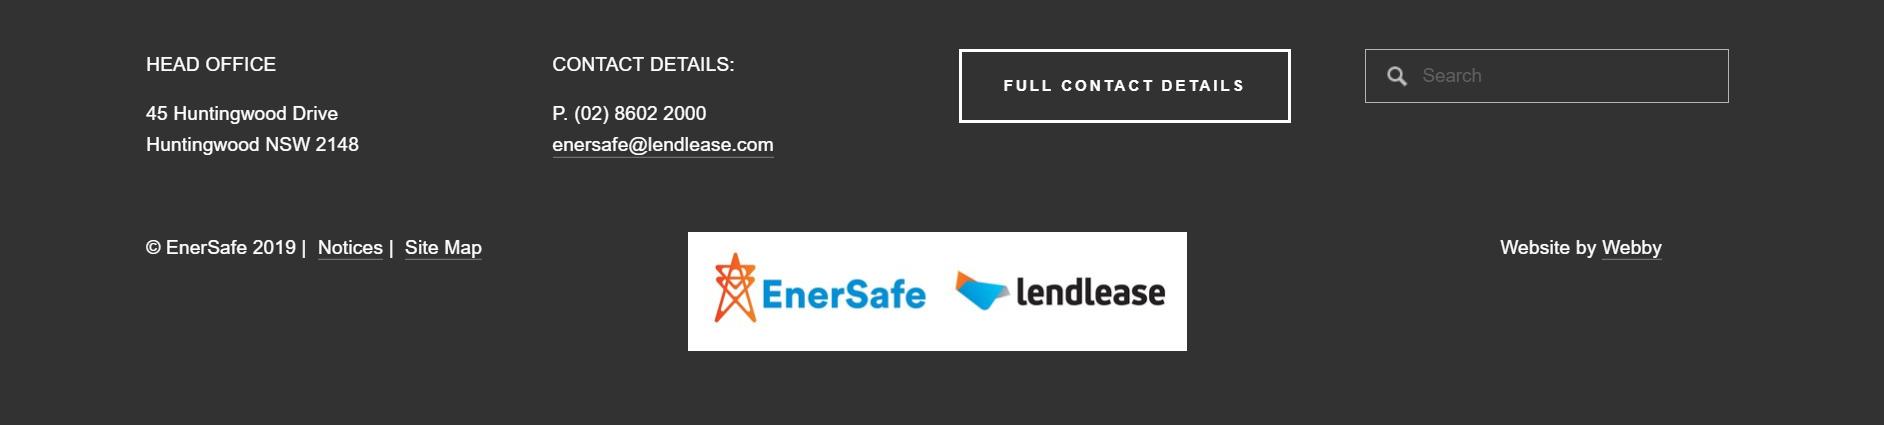 Enersafe (Squarespace website footer)